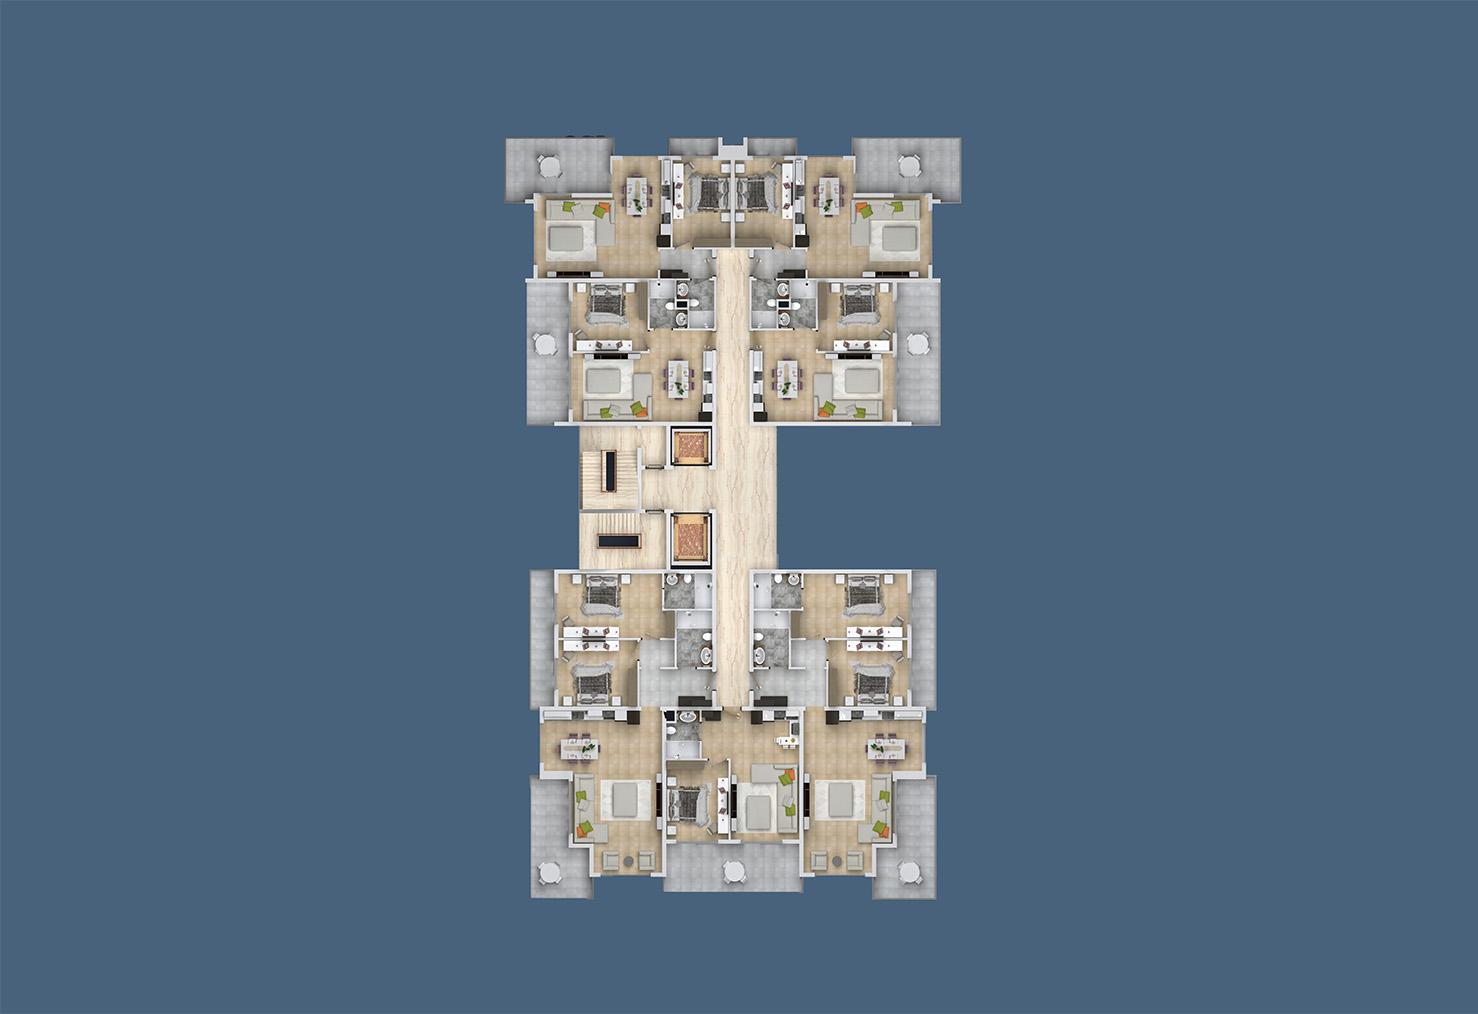 Floor plans of apartments 4 floor «D» Yekta Kingdom Trade Center